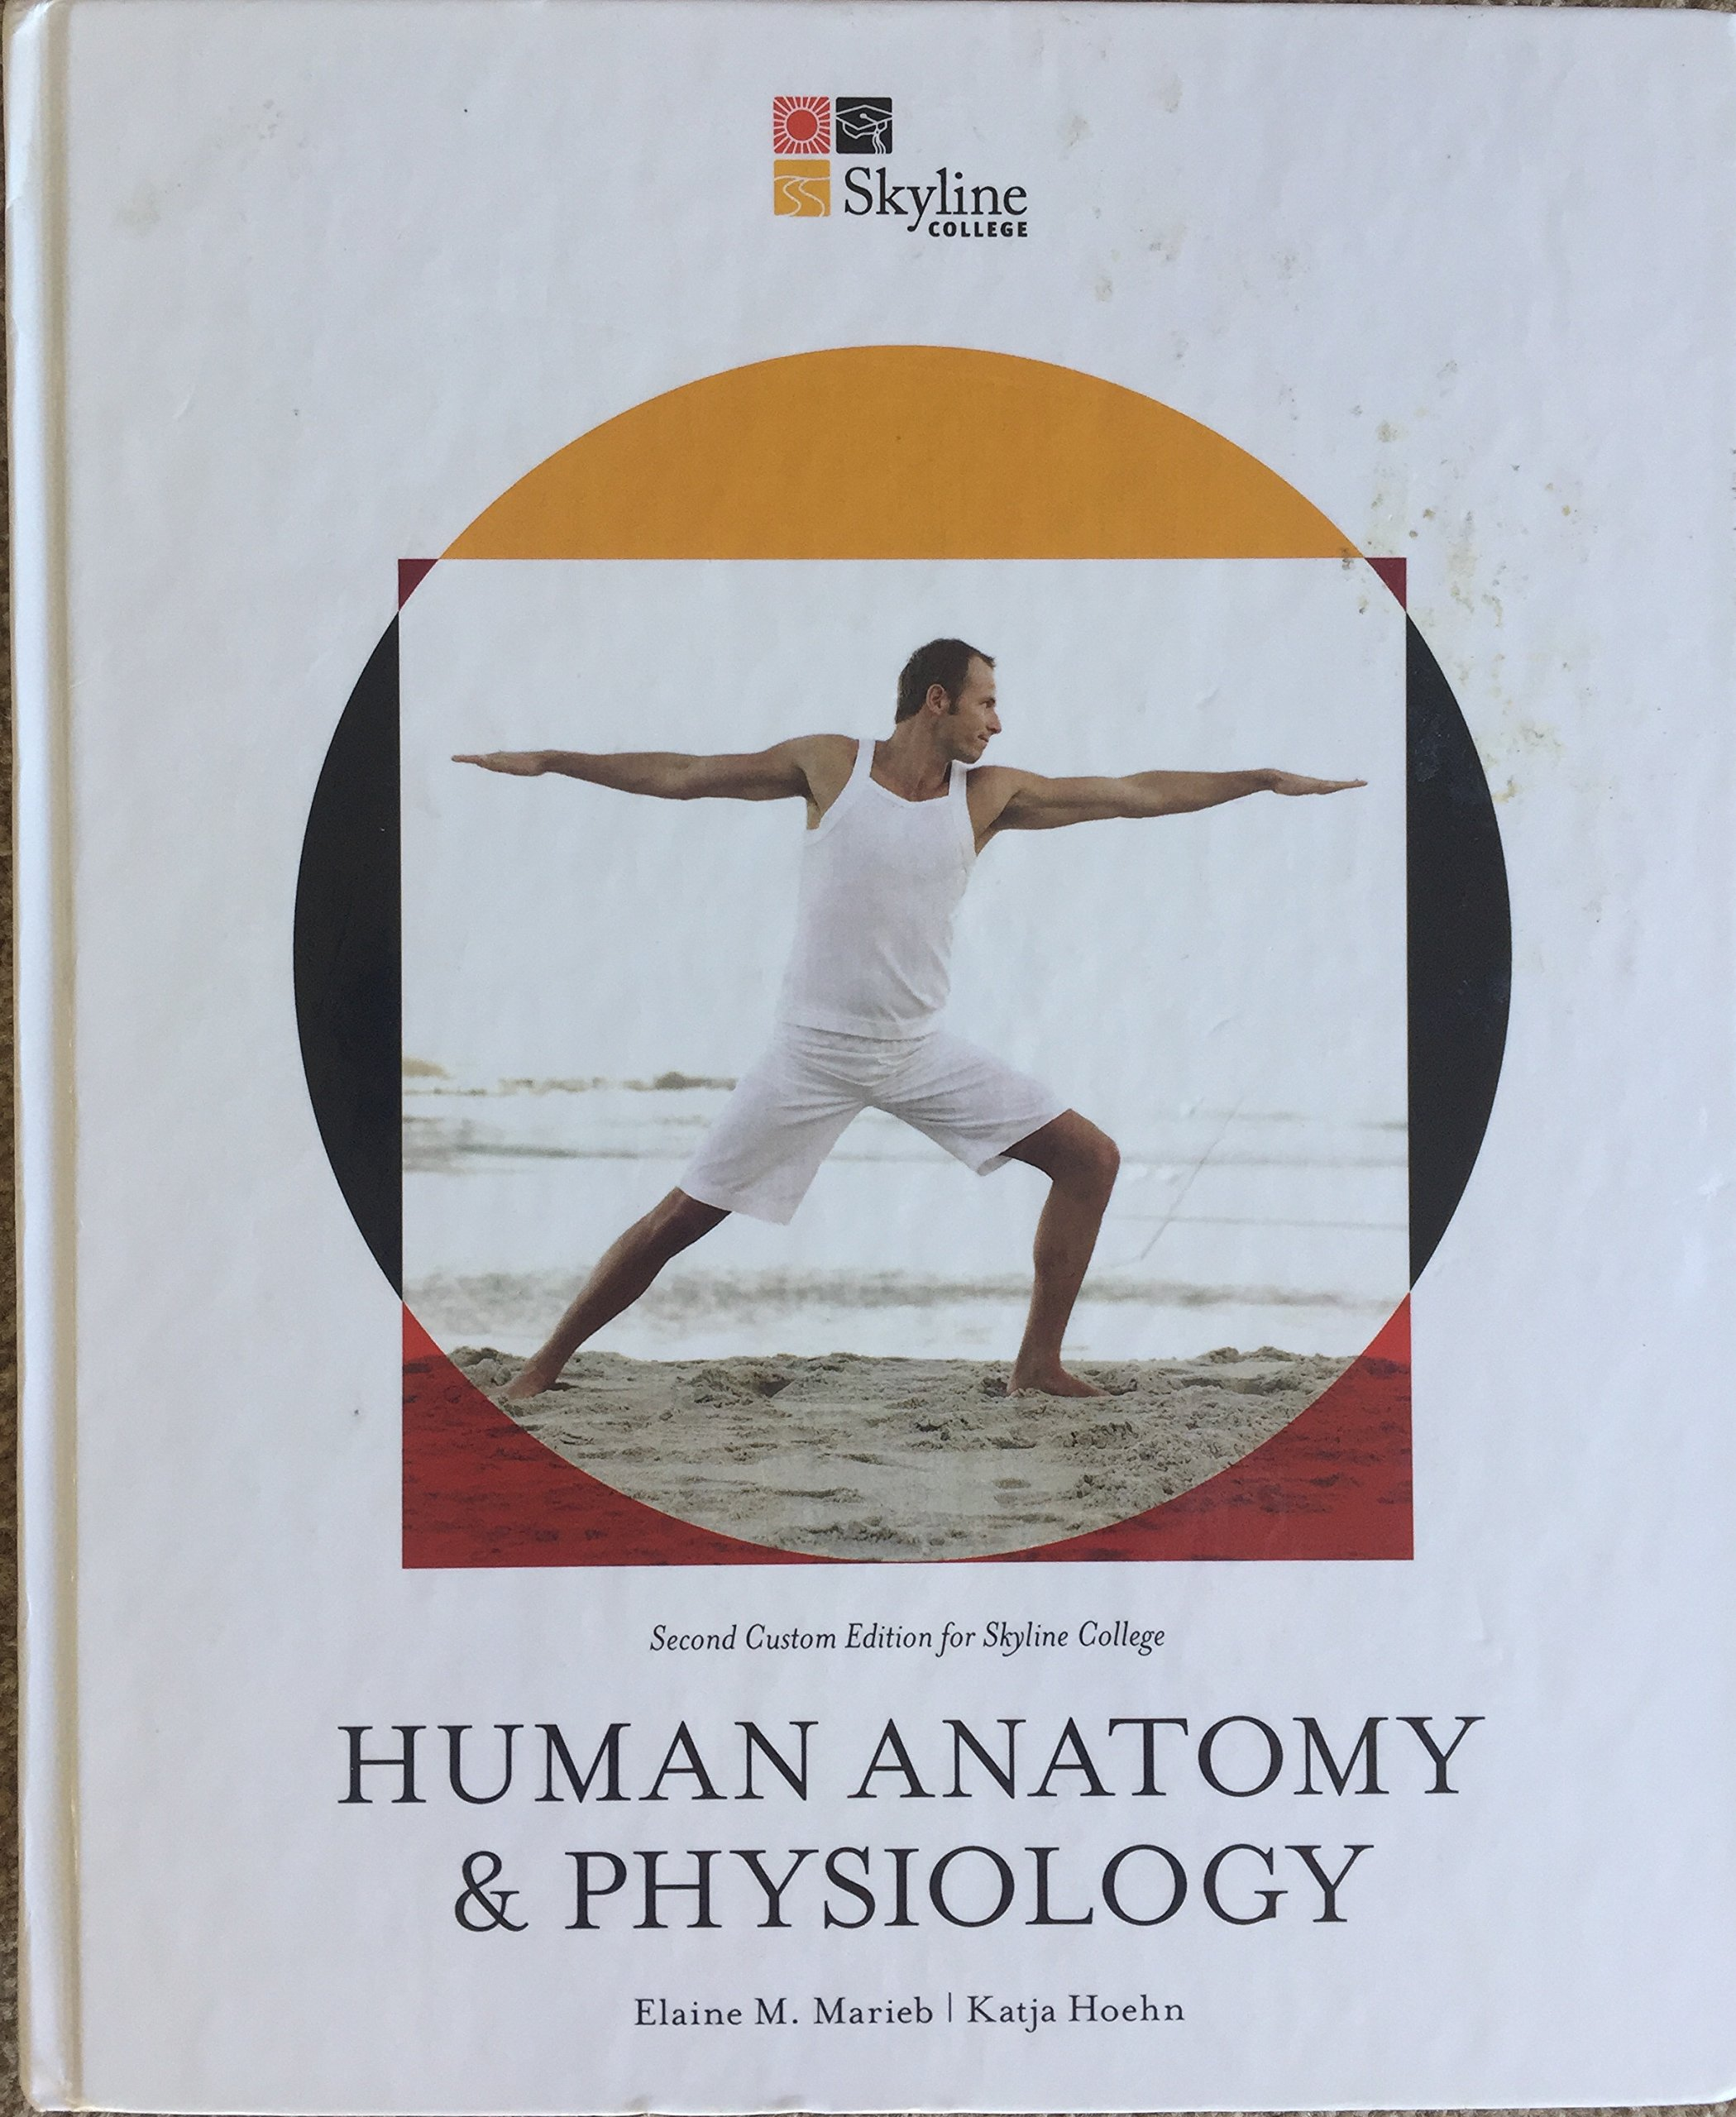 Human Anatomy And Physiology Elaine M Marieb Katja Hoehn